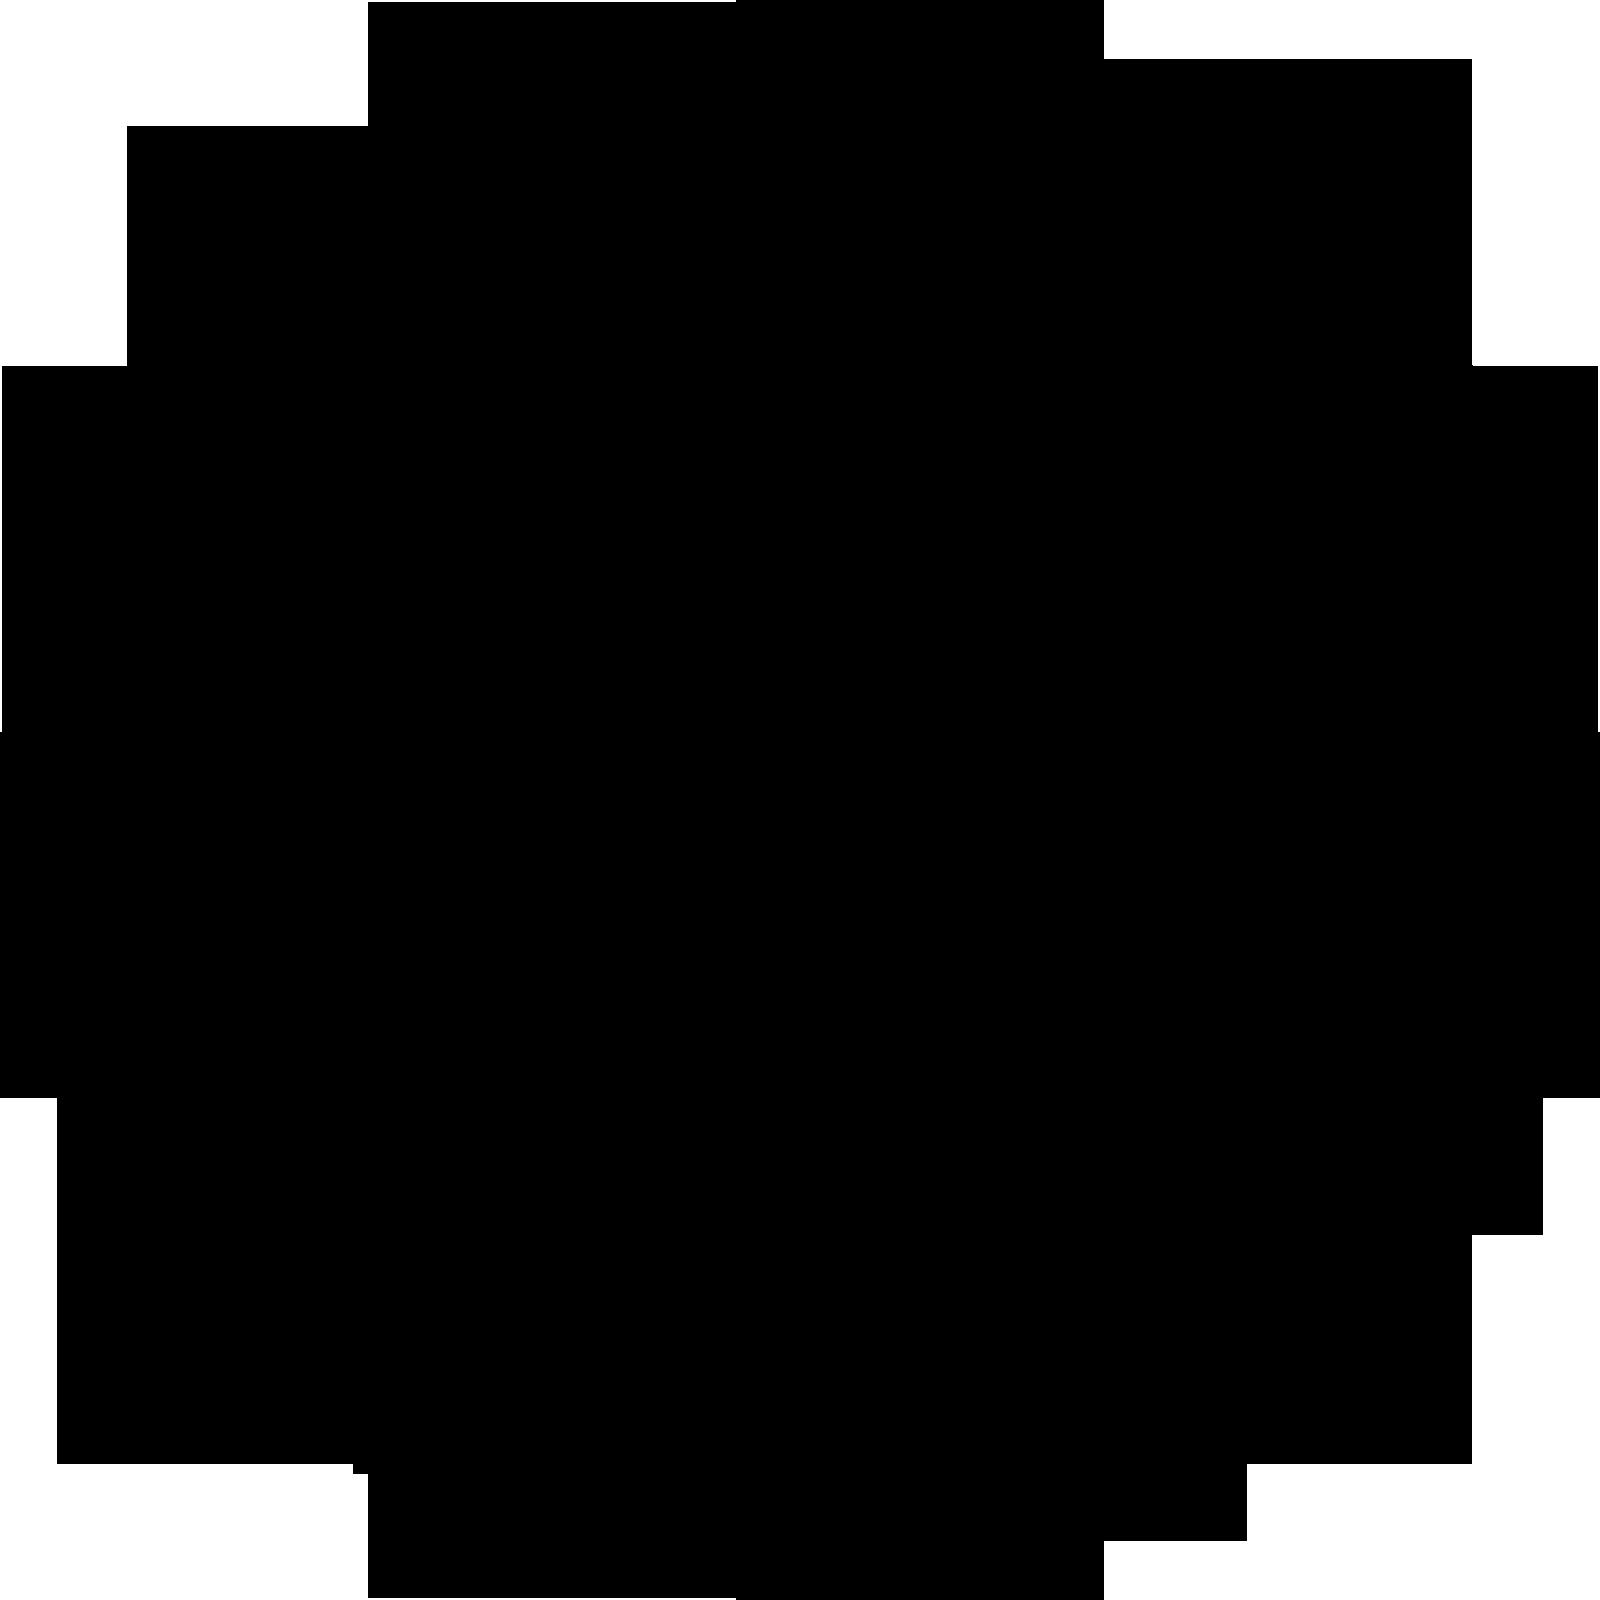 Galacticrepublic Logo Png Star Wars Silhouette Star Wars Symbols Star Wars Stencil